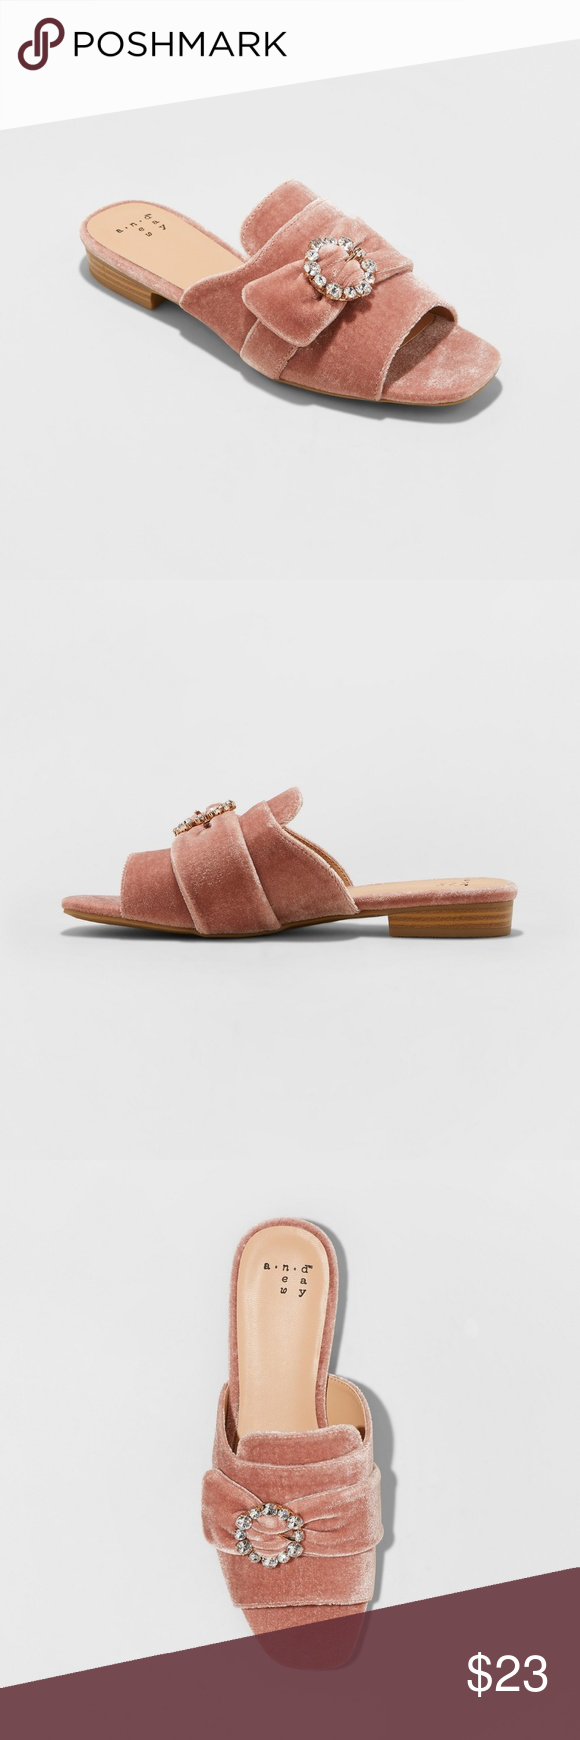 46d7f4e7593c A New Day Blush Dina Velvet Slide Sandals New Women s A New Day™ Blush Dina  Velvet Embellished Slide Sandals Color  Blush Size  7.5 Shoe Width  Medium  Care ...